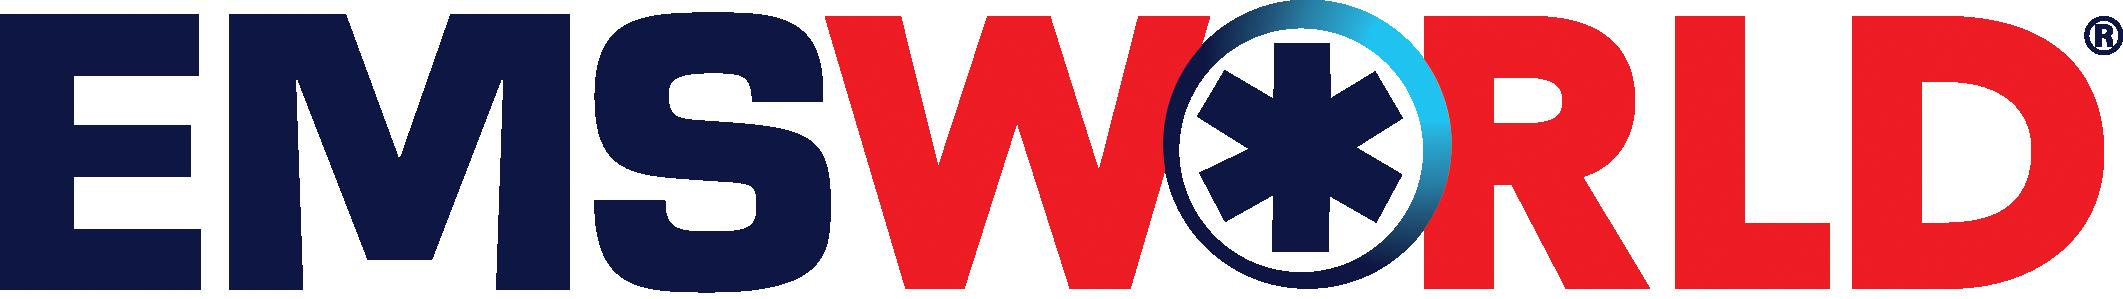 emsworld